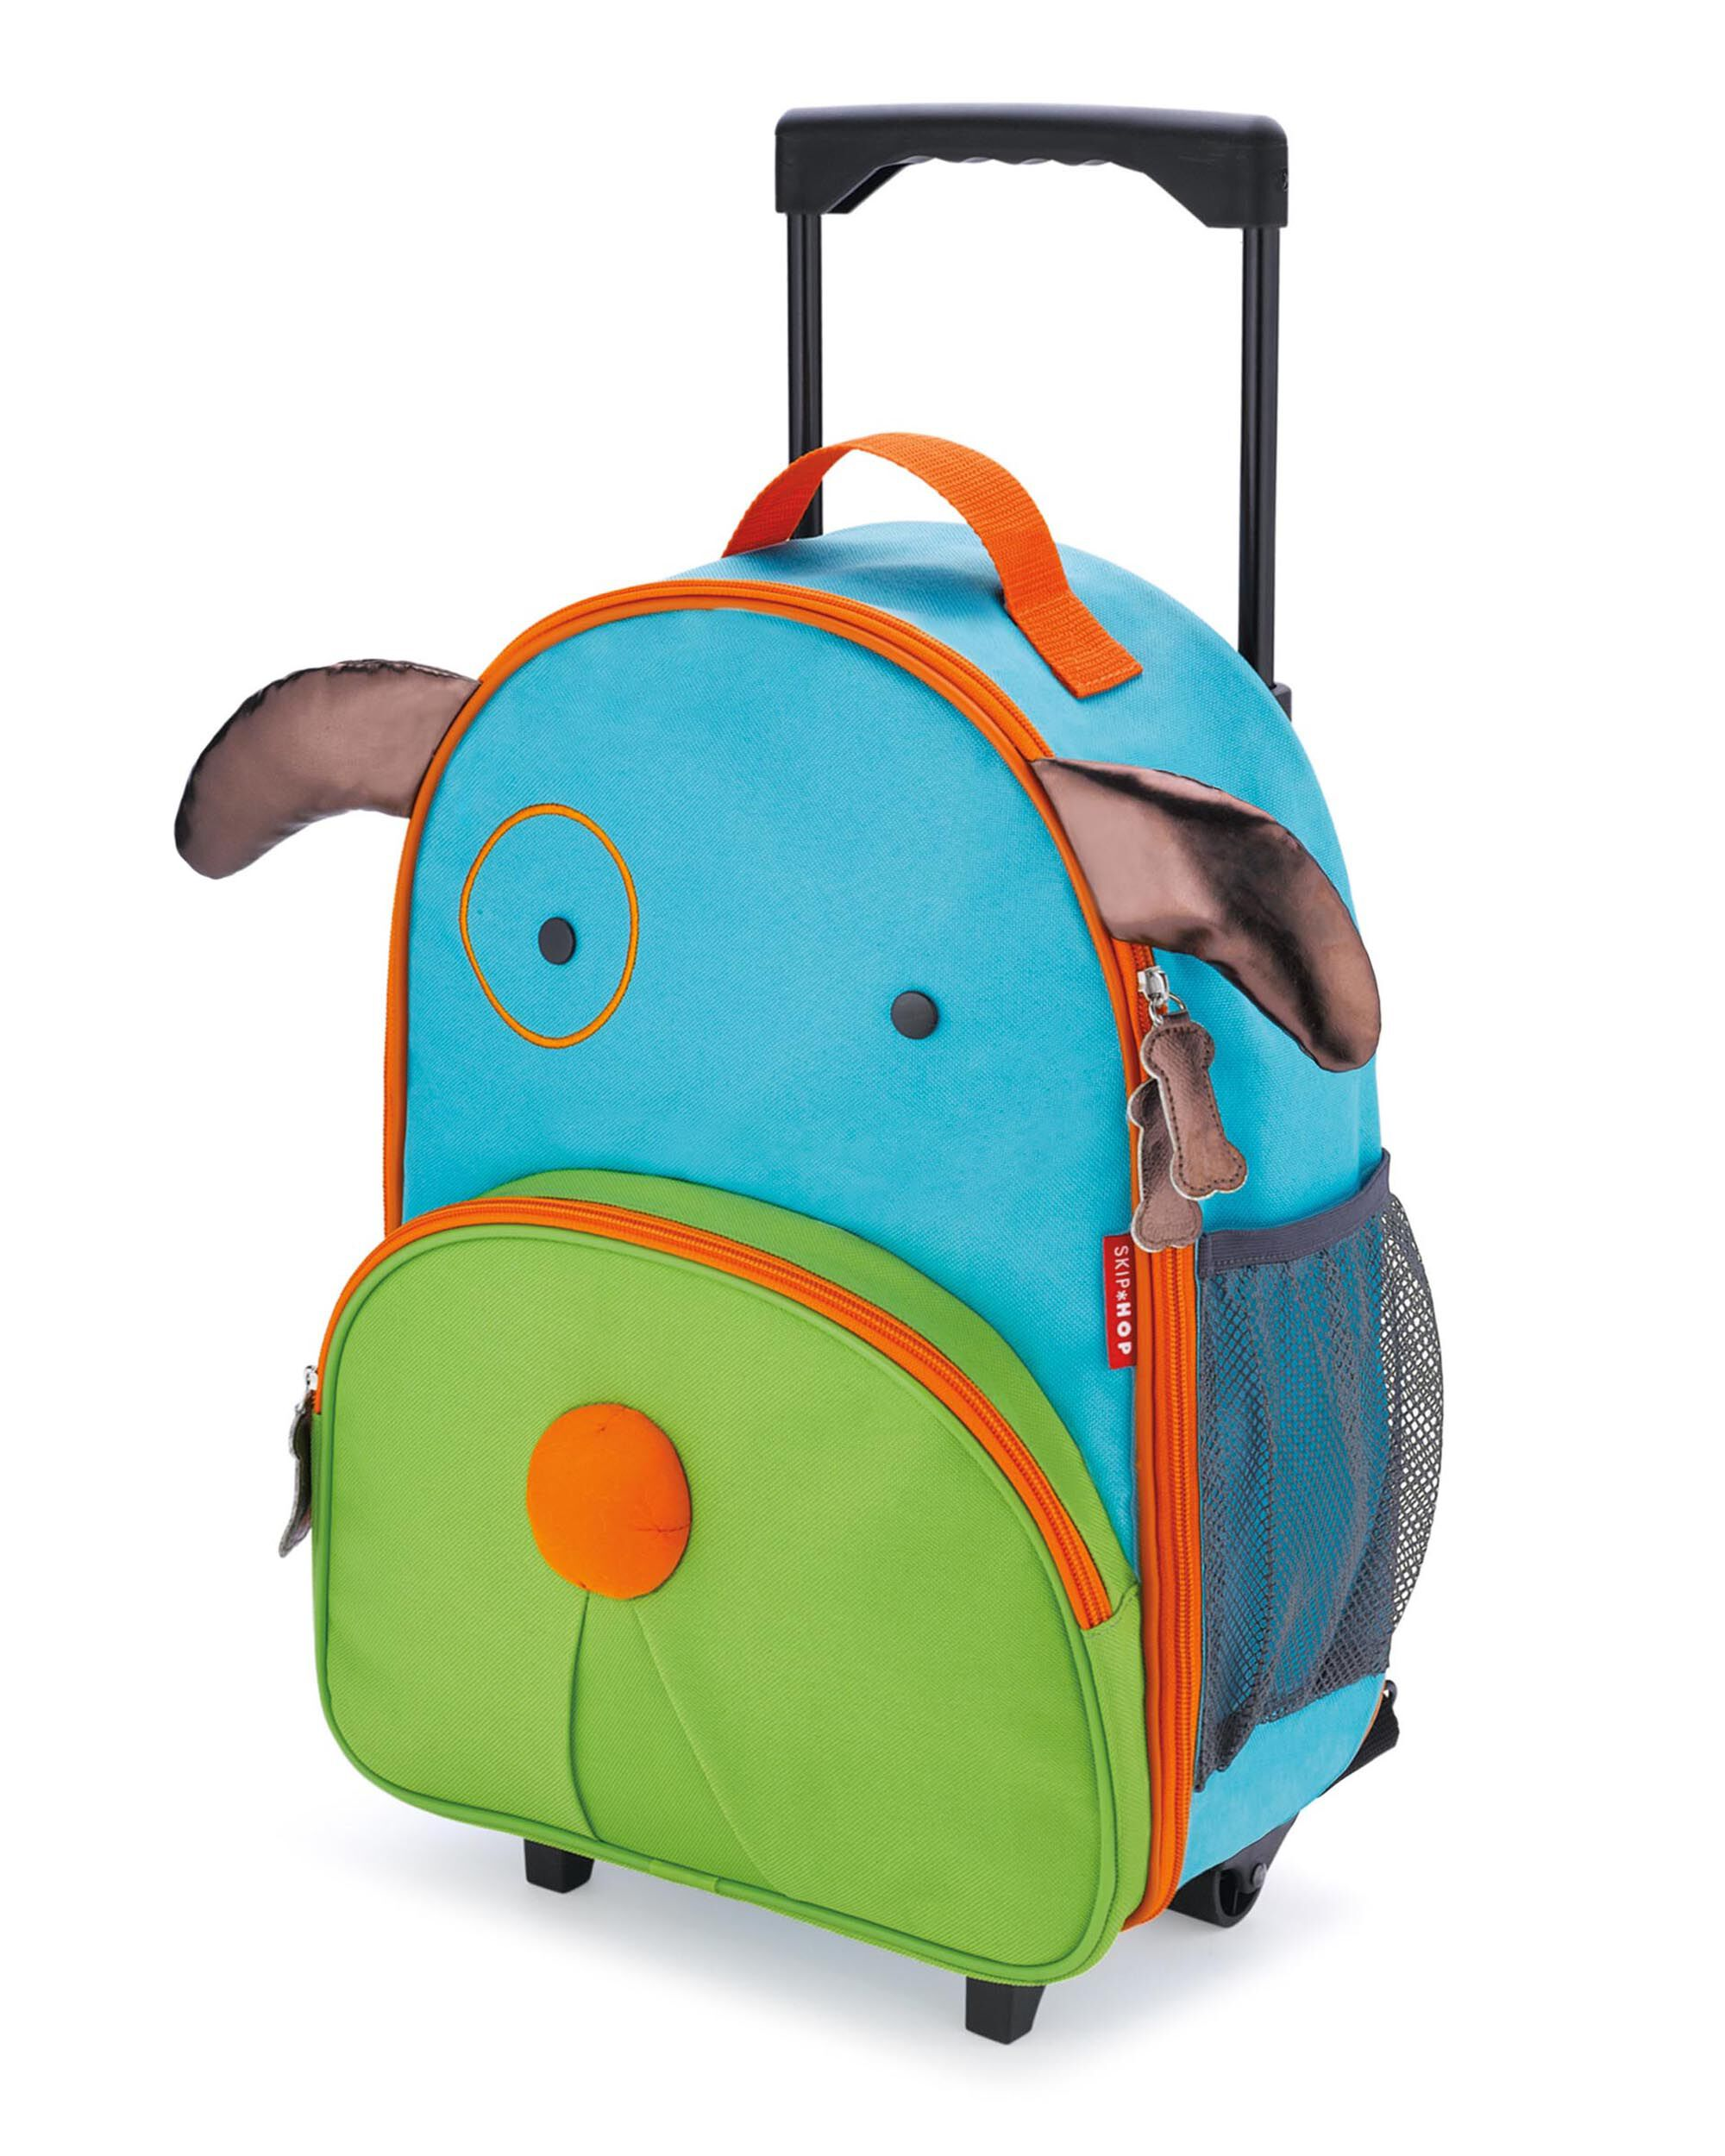 Zoo Rolling Luggage